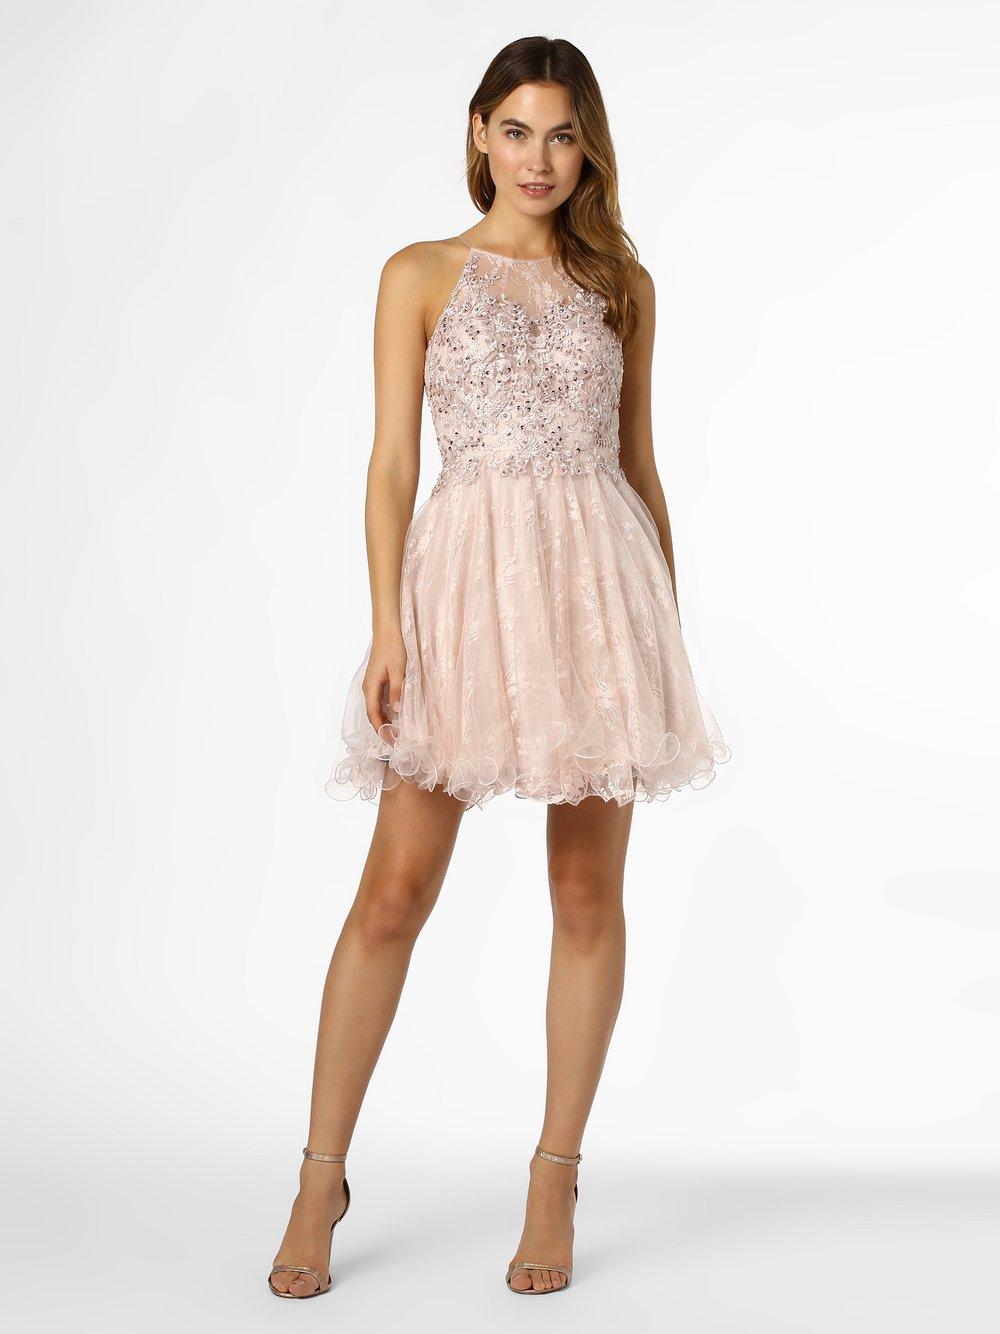 Laona – Damska sukienka wieczorowa, beżowy Van Graaf 456291-0001